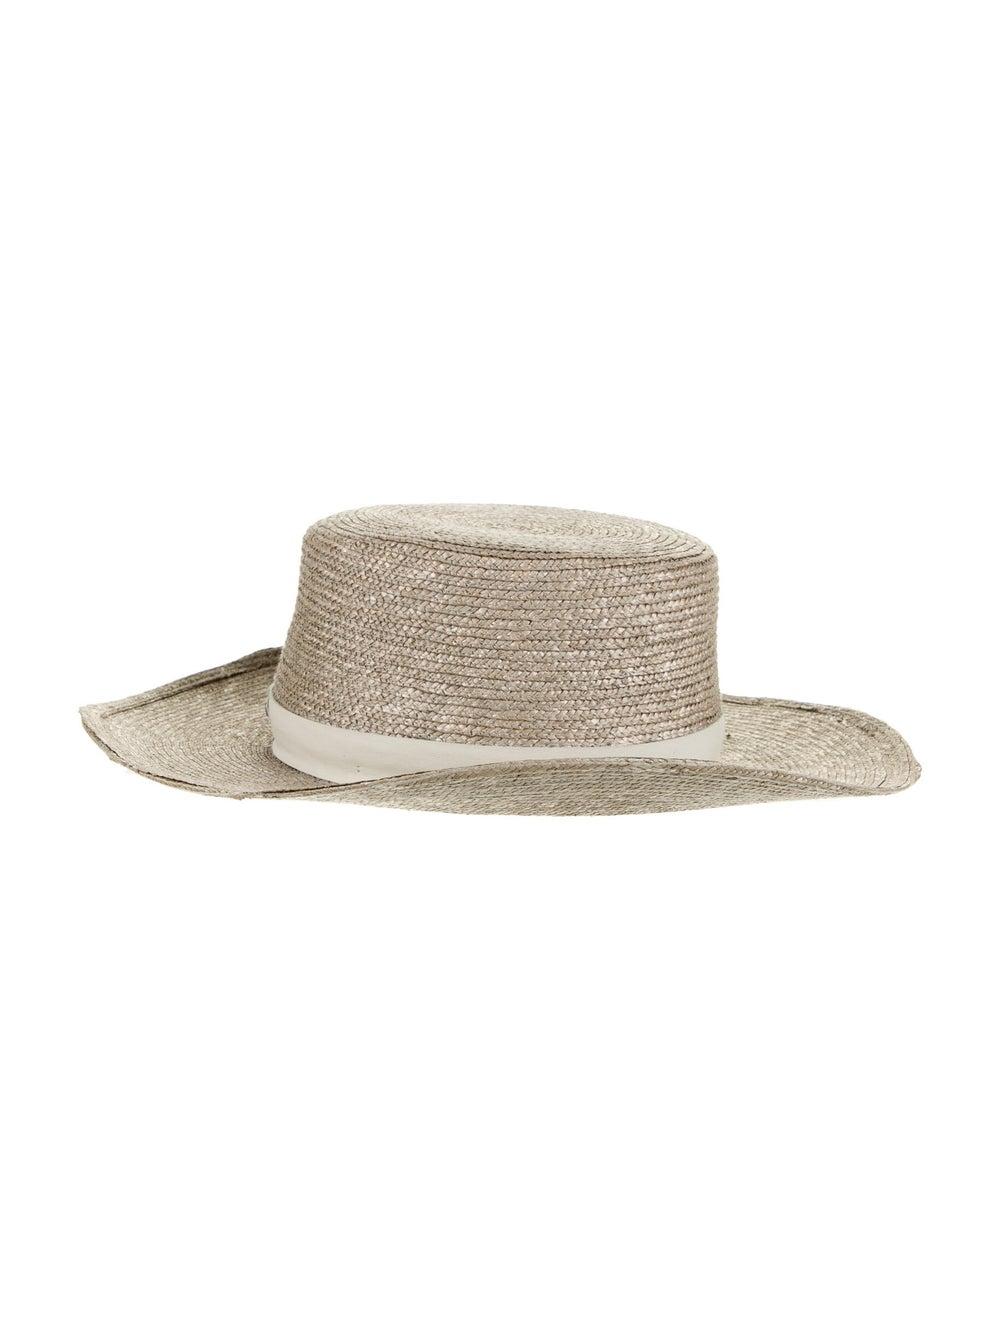 Janessa Leone Straw Sun Hat - image 2